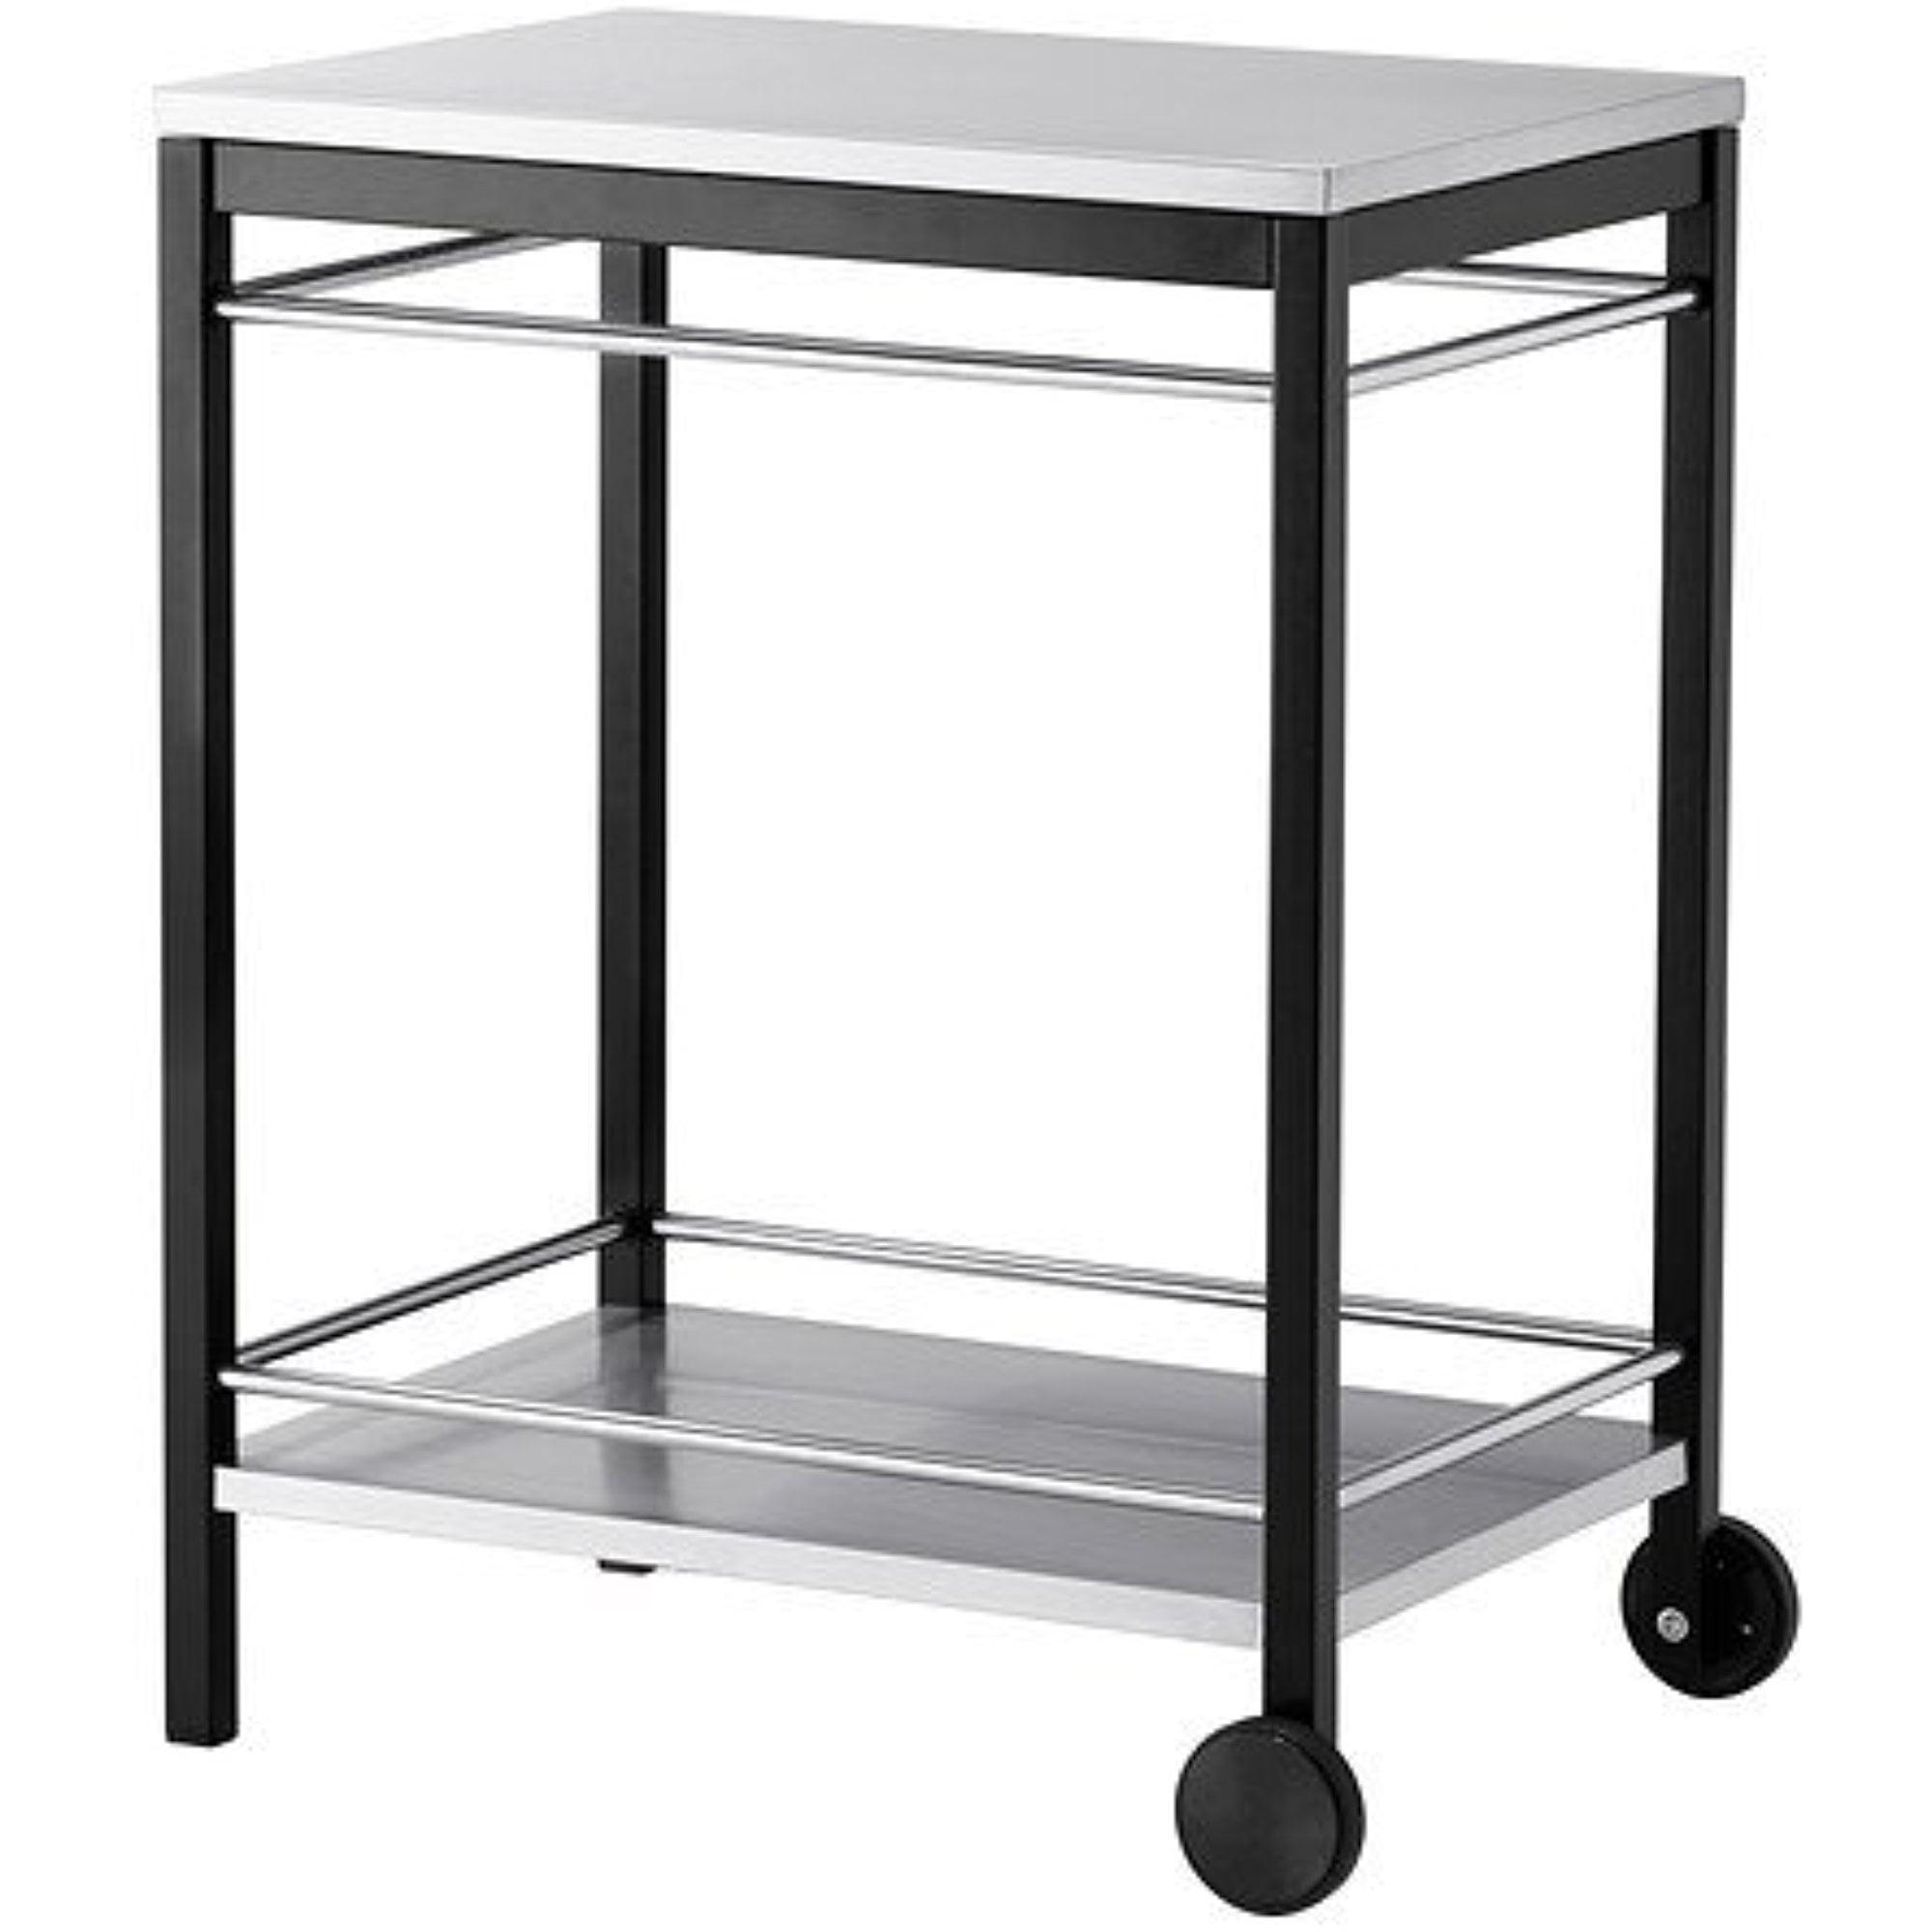 Ikea Serving cart, outdoor, stainless steel black 183838.11526.26